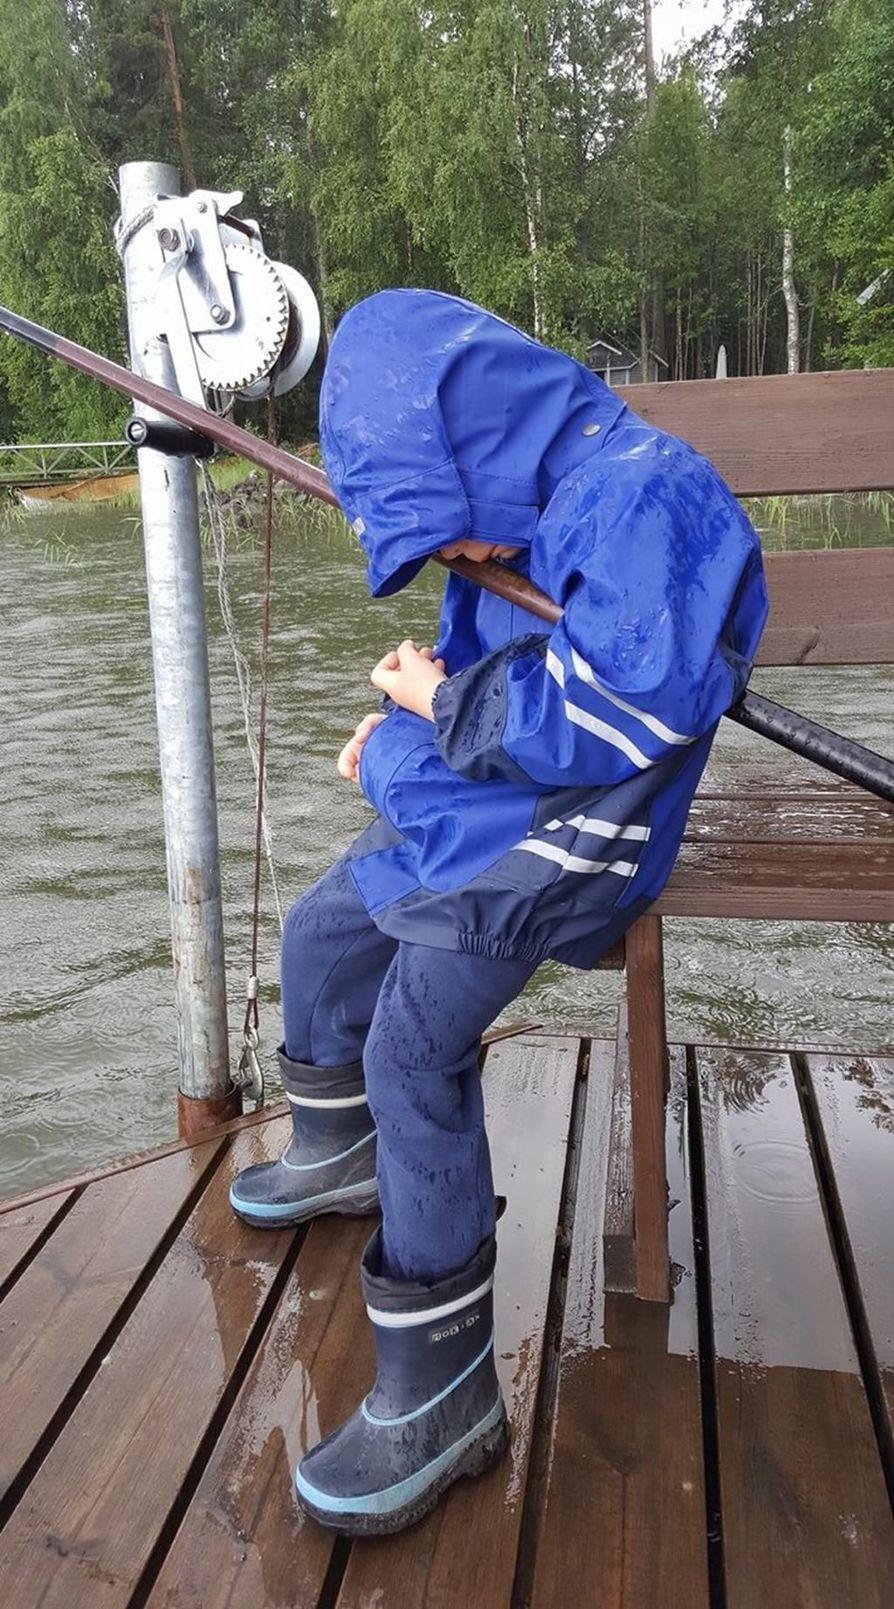 Väsy iski kalamieheen, Aleksi 4 v.